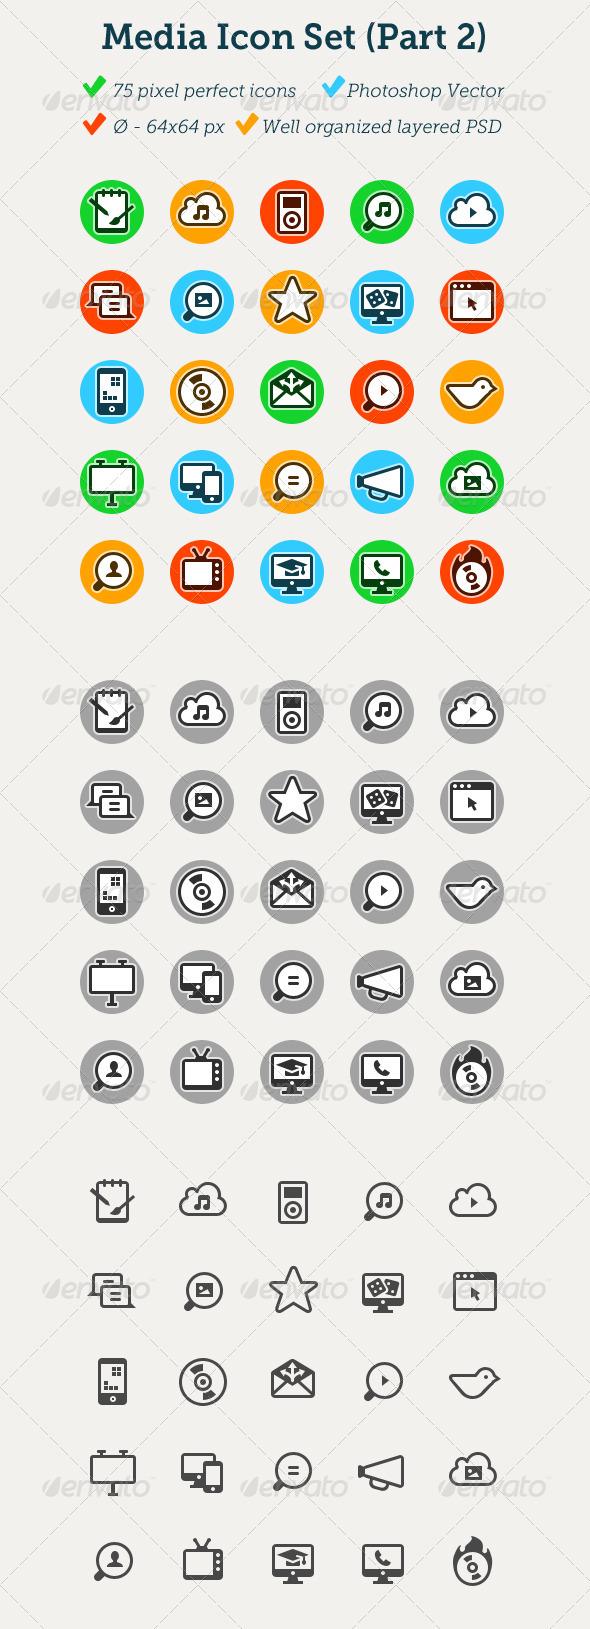 Media Icon Set (part 2) - Media Icons